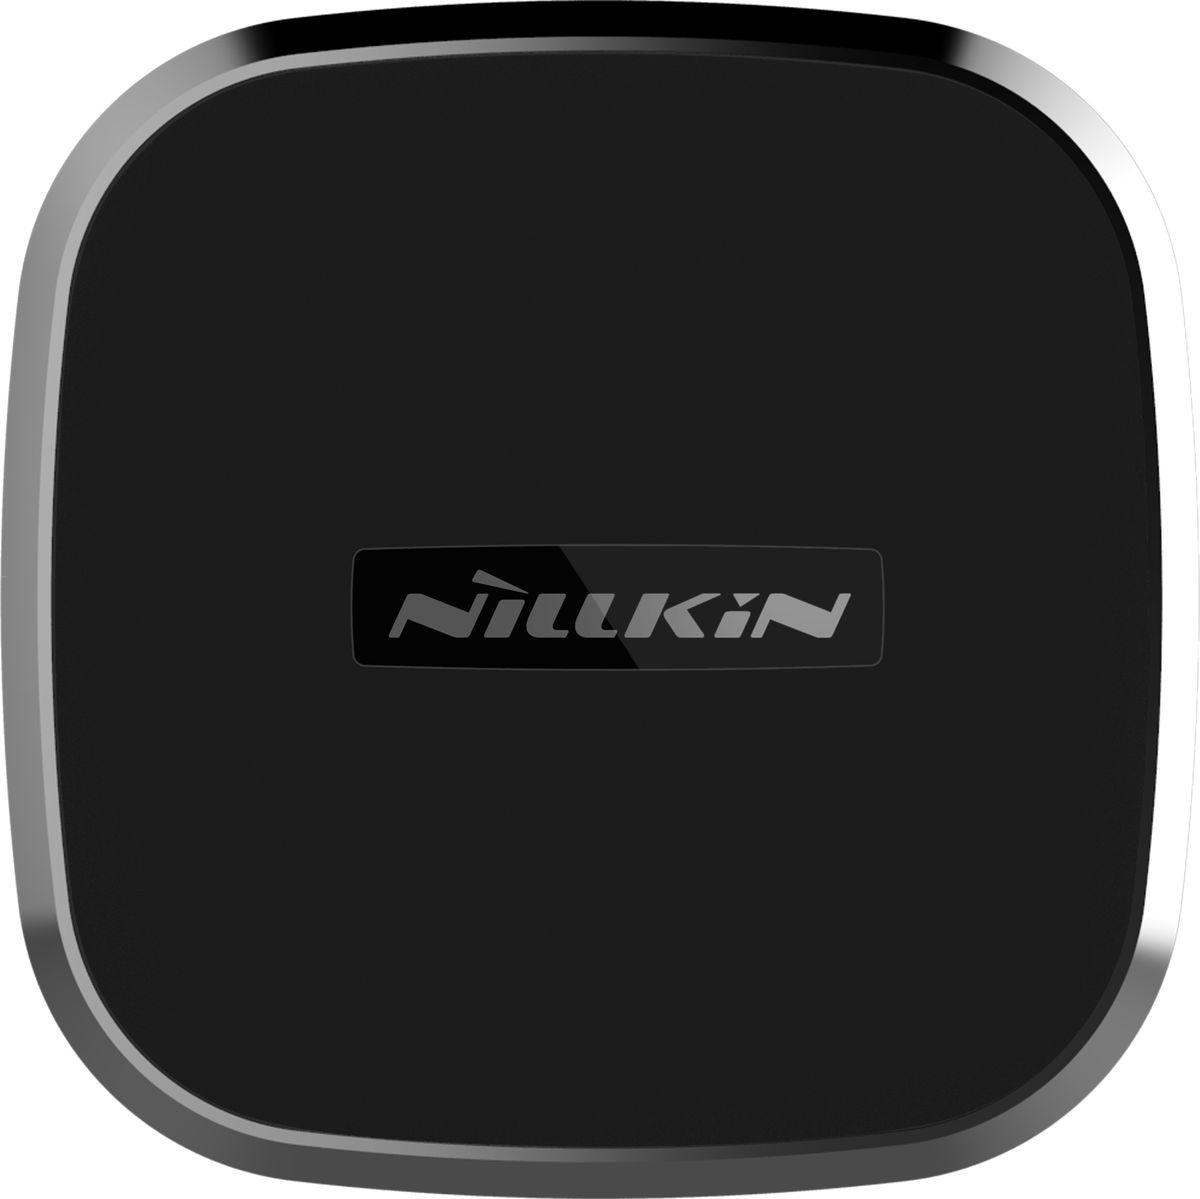 Nillkin Car Magnetic Wireless Charger 2B автомобильное зарядное устройство - Зарядные устройства и док-станции